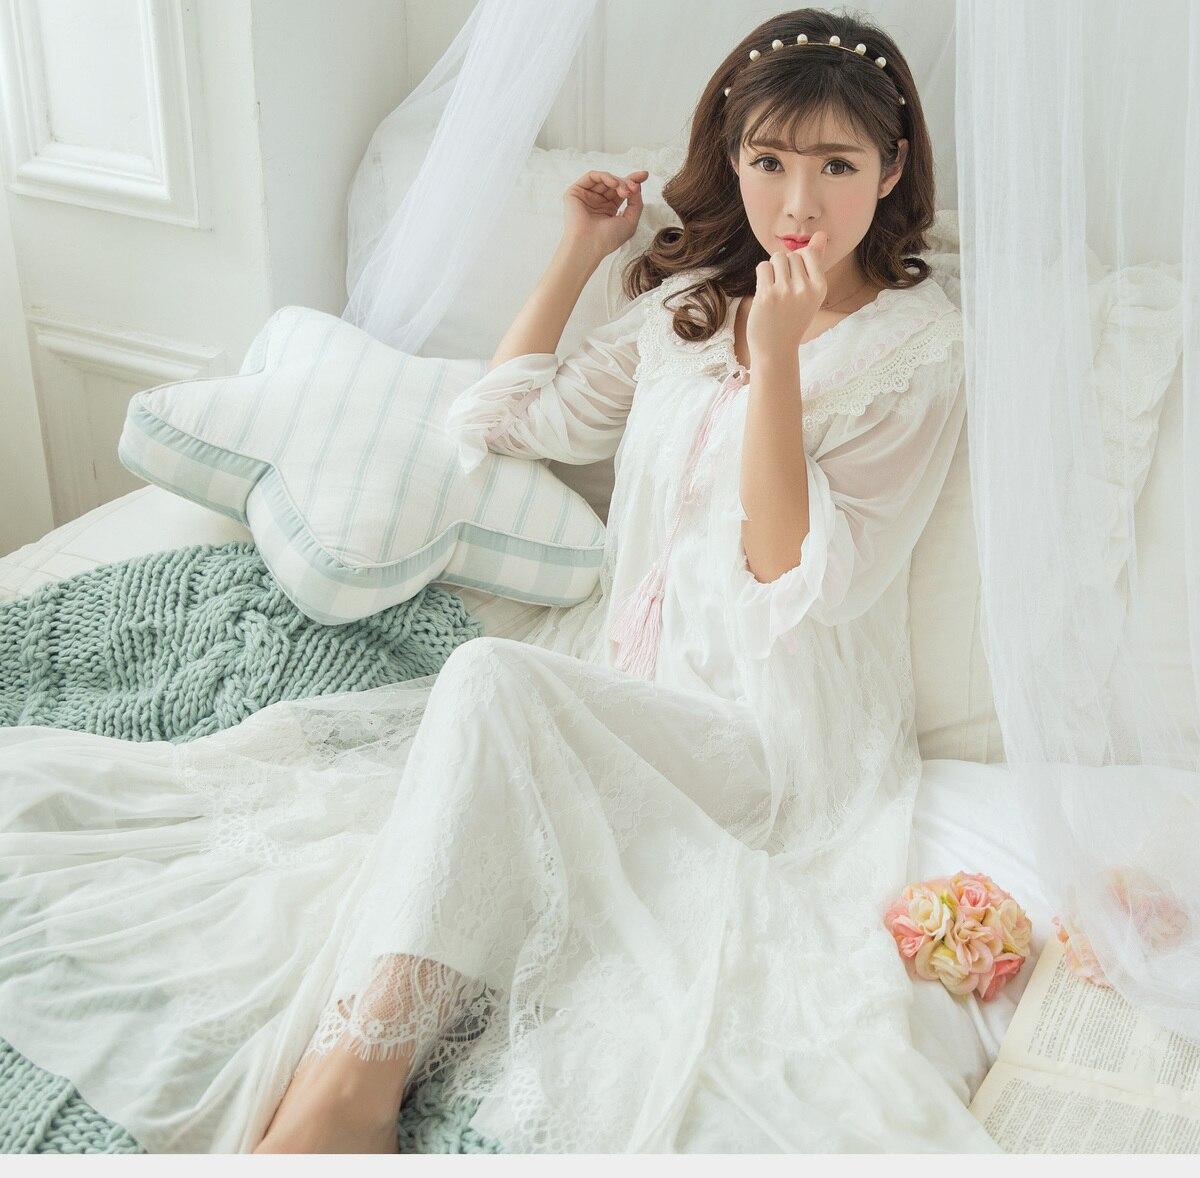 8a816ed0d RenYvtil 2017 2 Cores Primavera Princesa Rendas Pijamas das Mulheres Camisolas  Longas 2 Peças Conjunto de Lingerie Roupão Gaze Sleepwear em Nightgowns ...